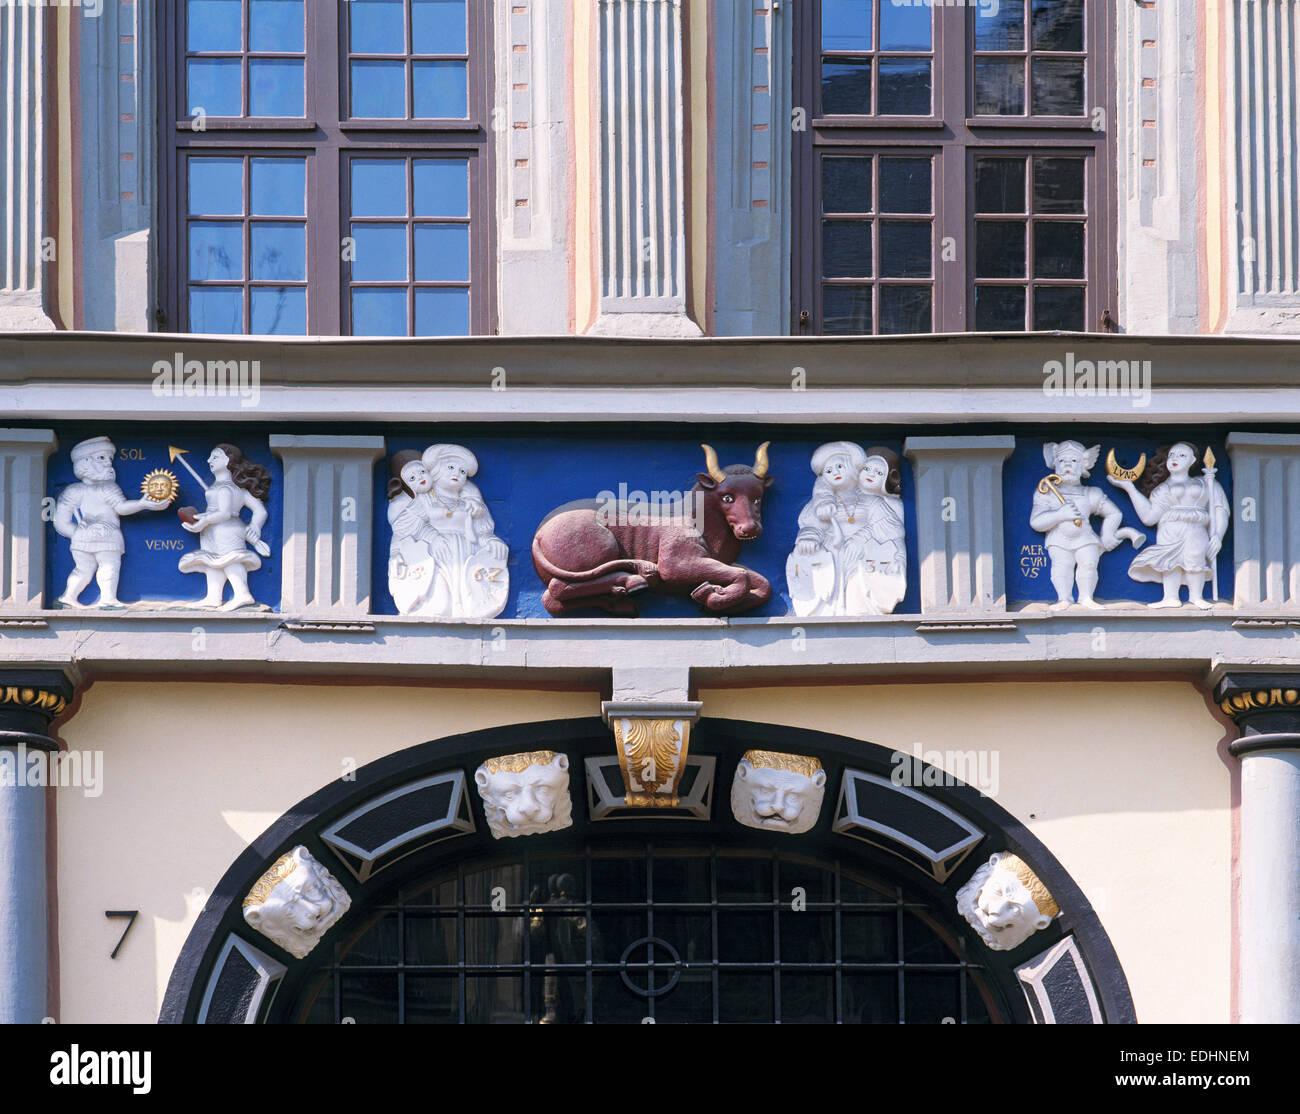 Haus Zum Roten Ochsen Fish Stockfotos & Haus Zum Roten Ochsen Fish ...